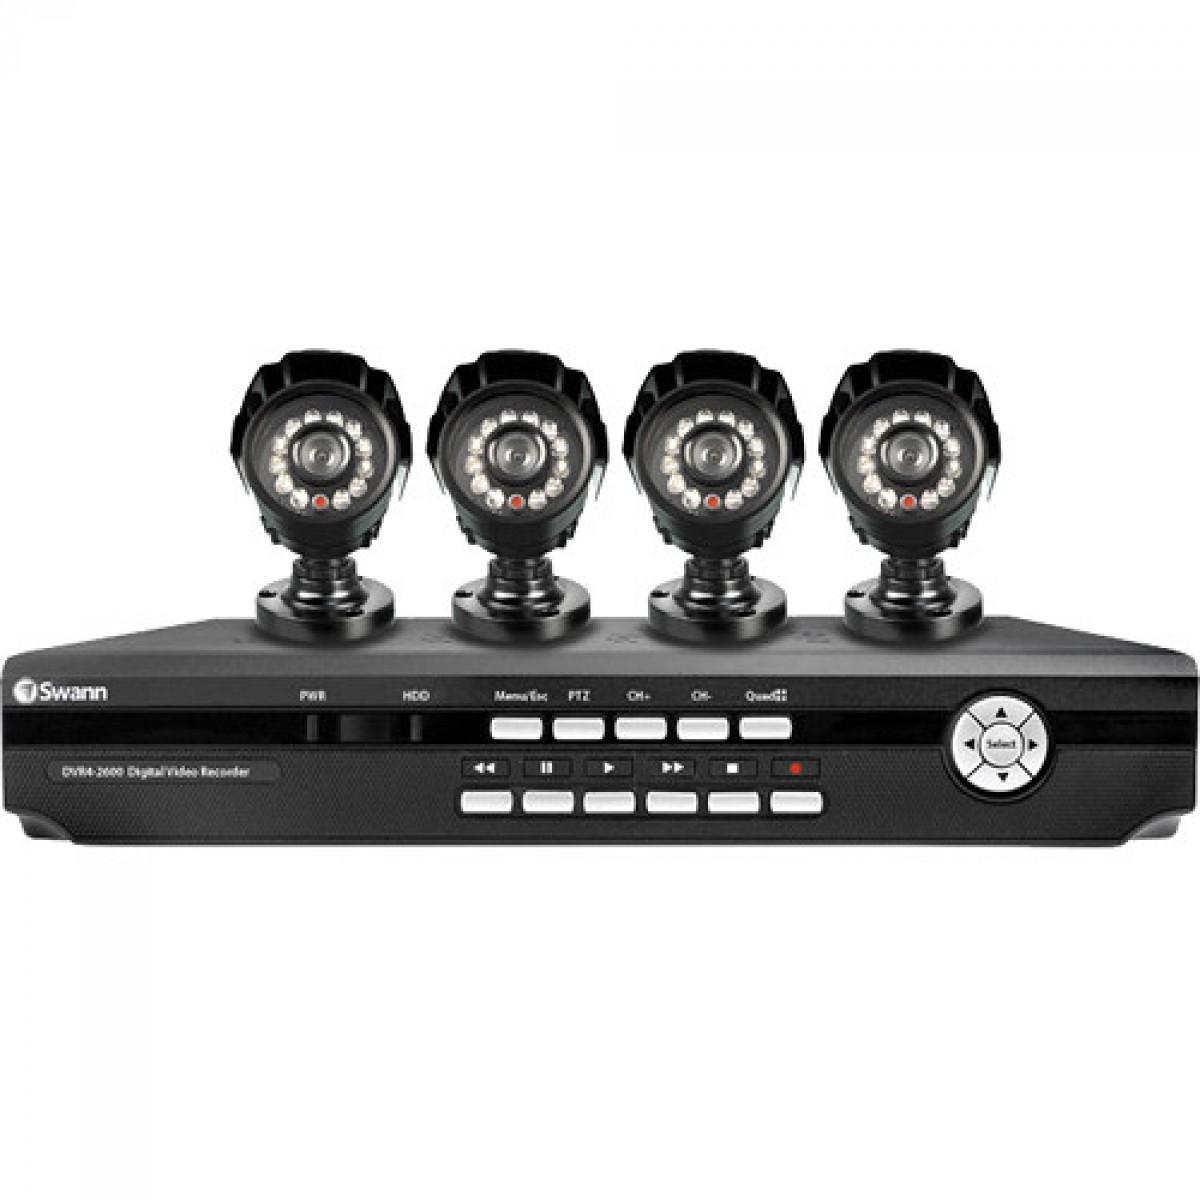 Swann DVR4-2600 DVR With 4 Channel & 4 Camera